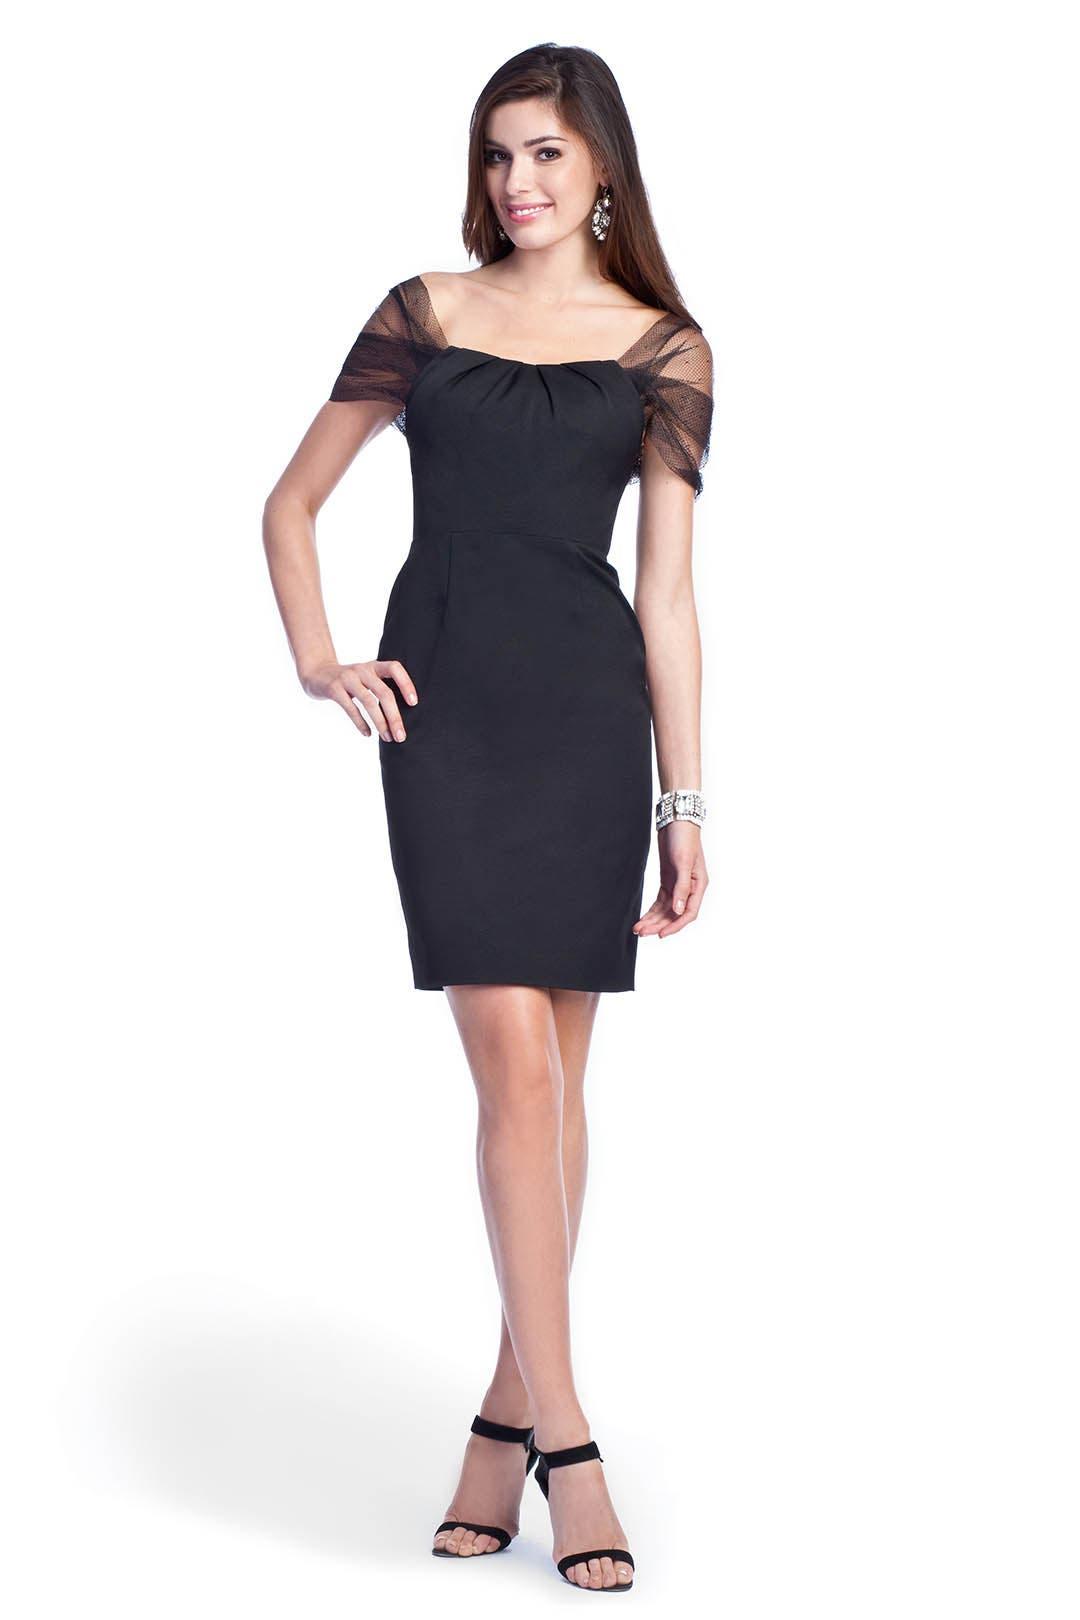 Tulle Elegance Dress by Lela Rose